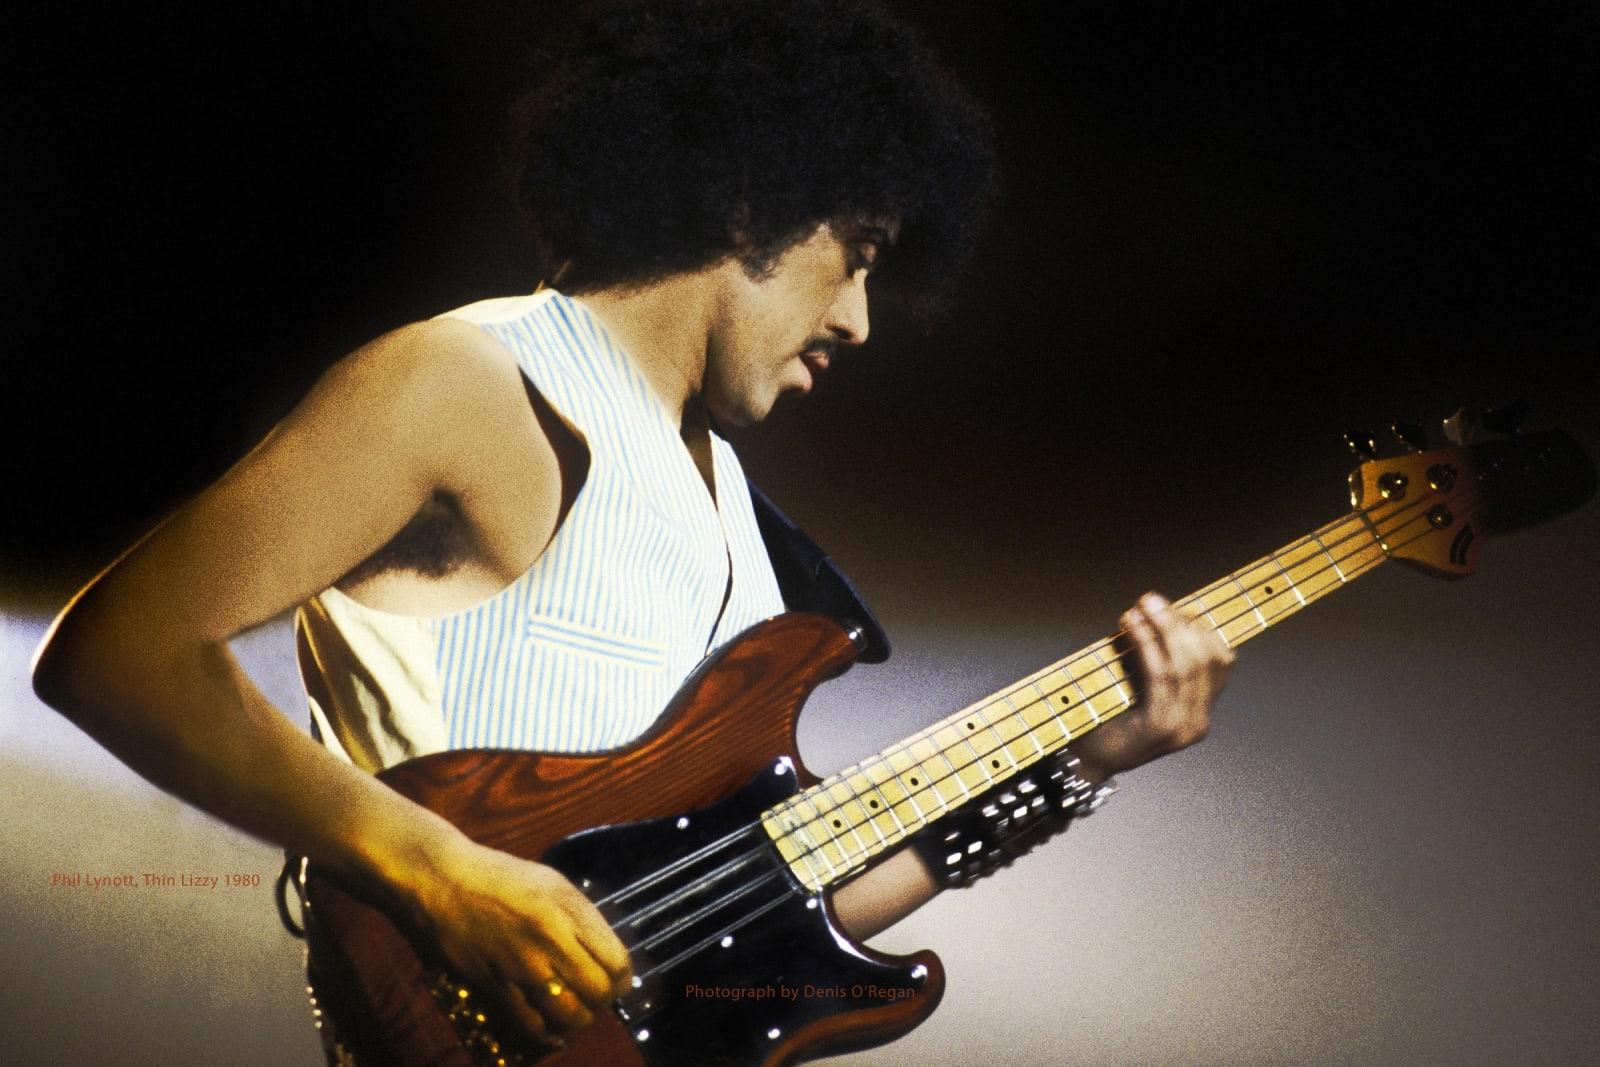 THIN LIZZY, Phil Lynott live, 1980